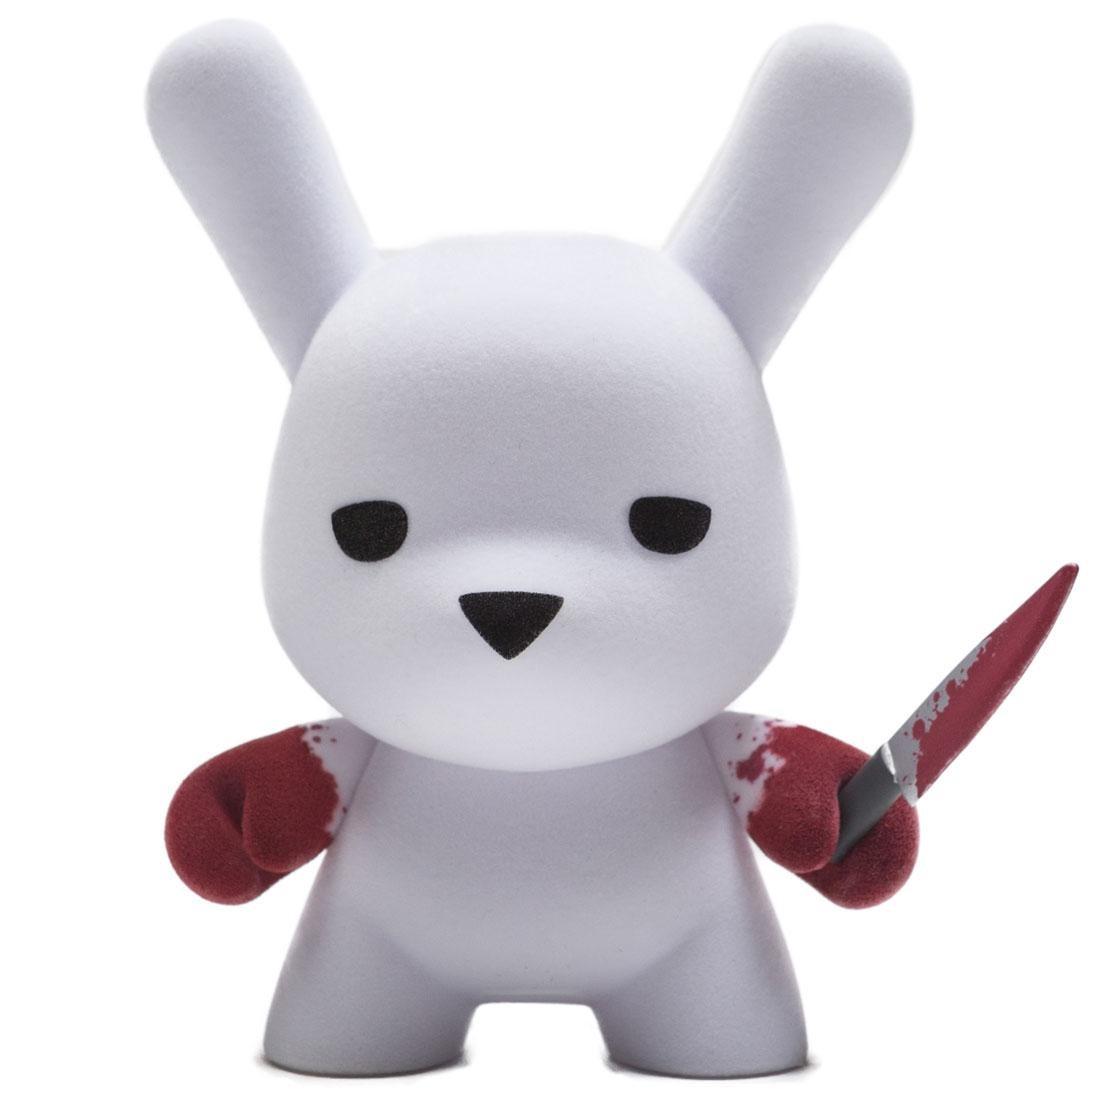 Kidrobot x Luke Chueh Wannabe Flocked Dunny 5 Inch Art Figure (white / red)